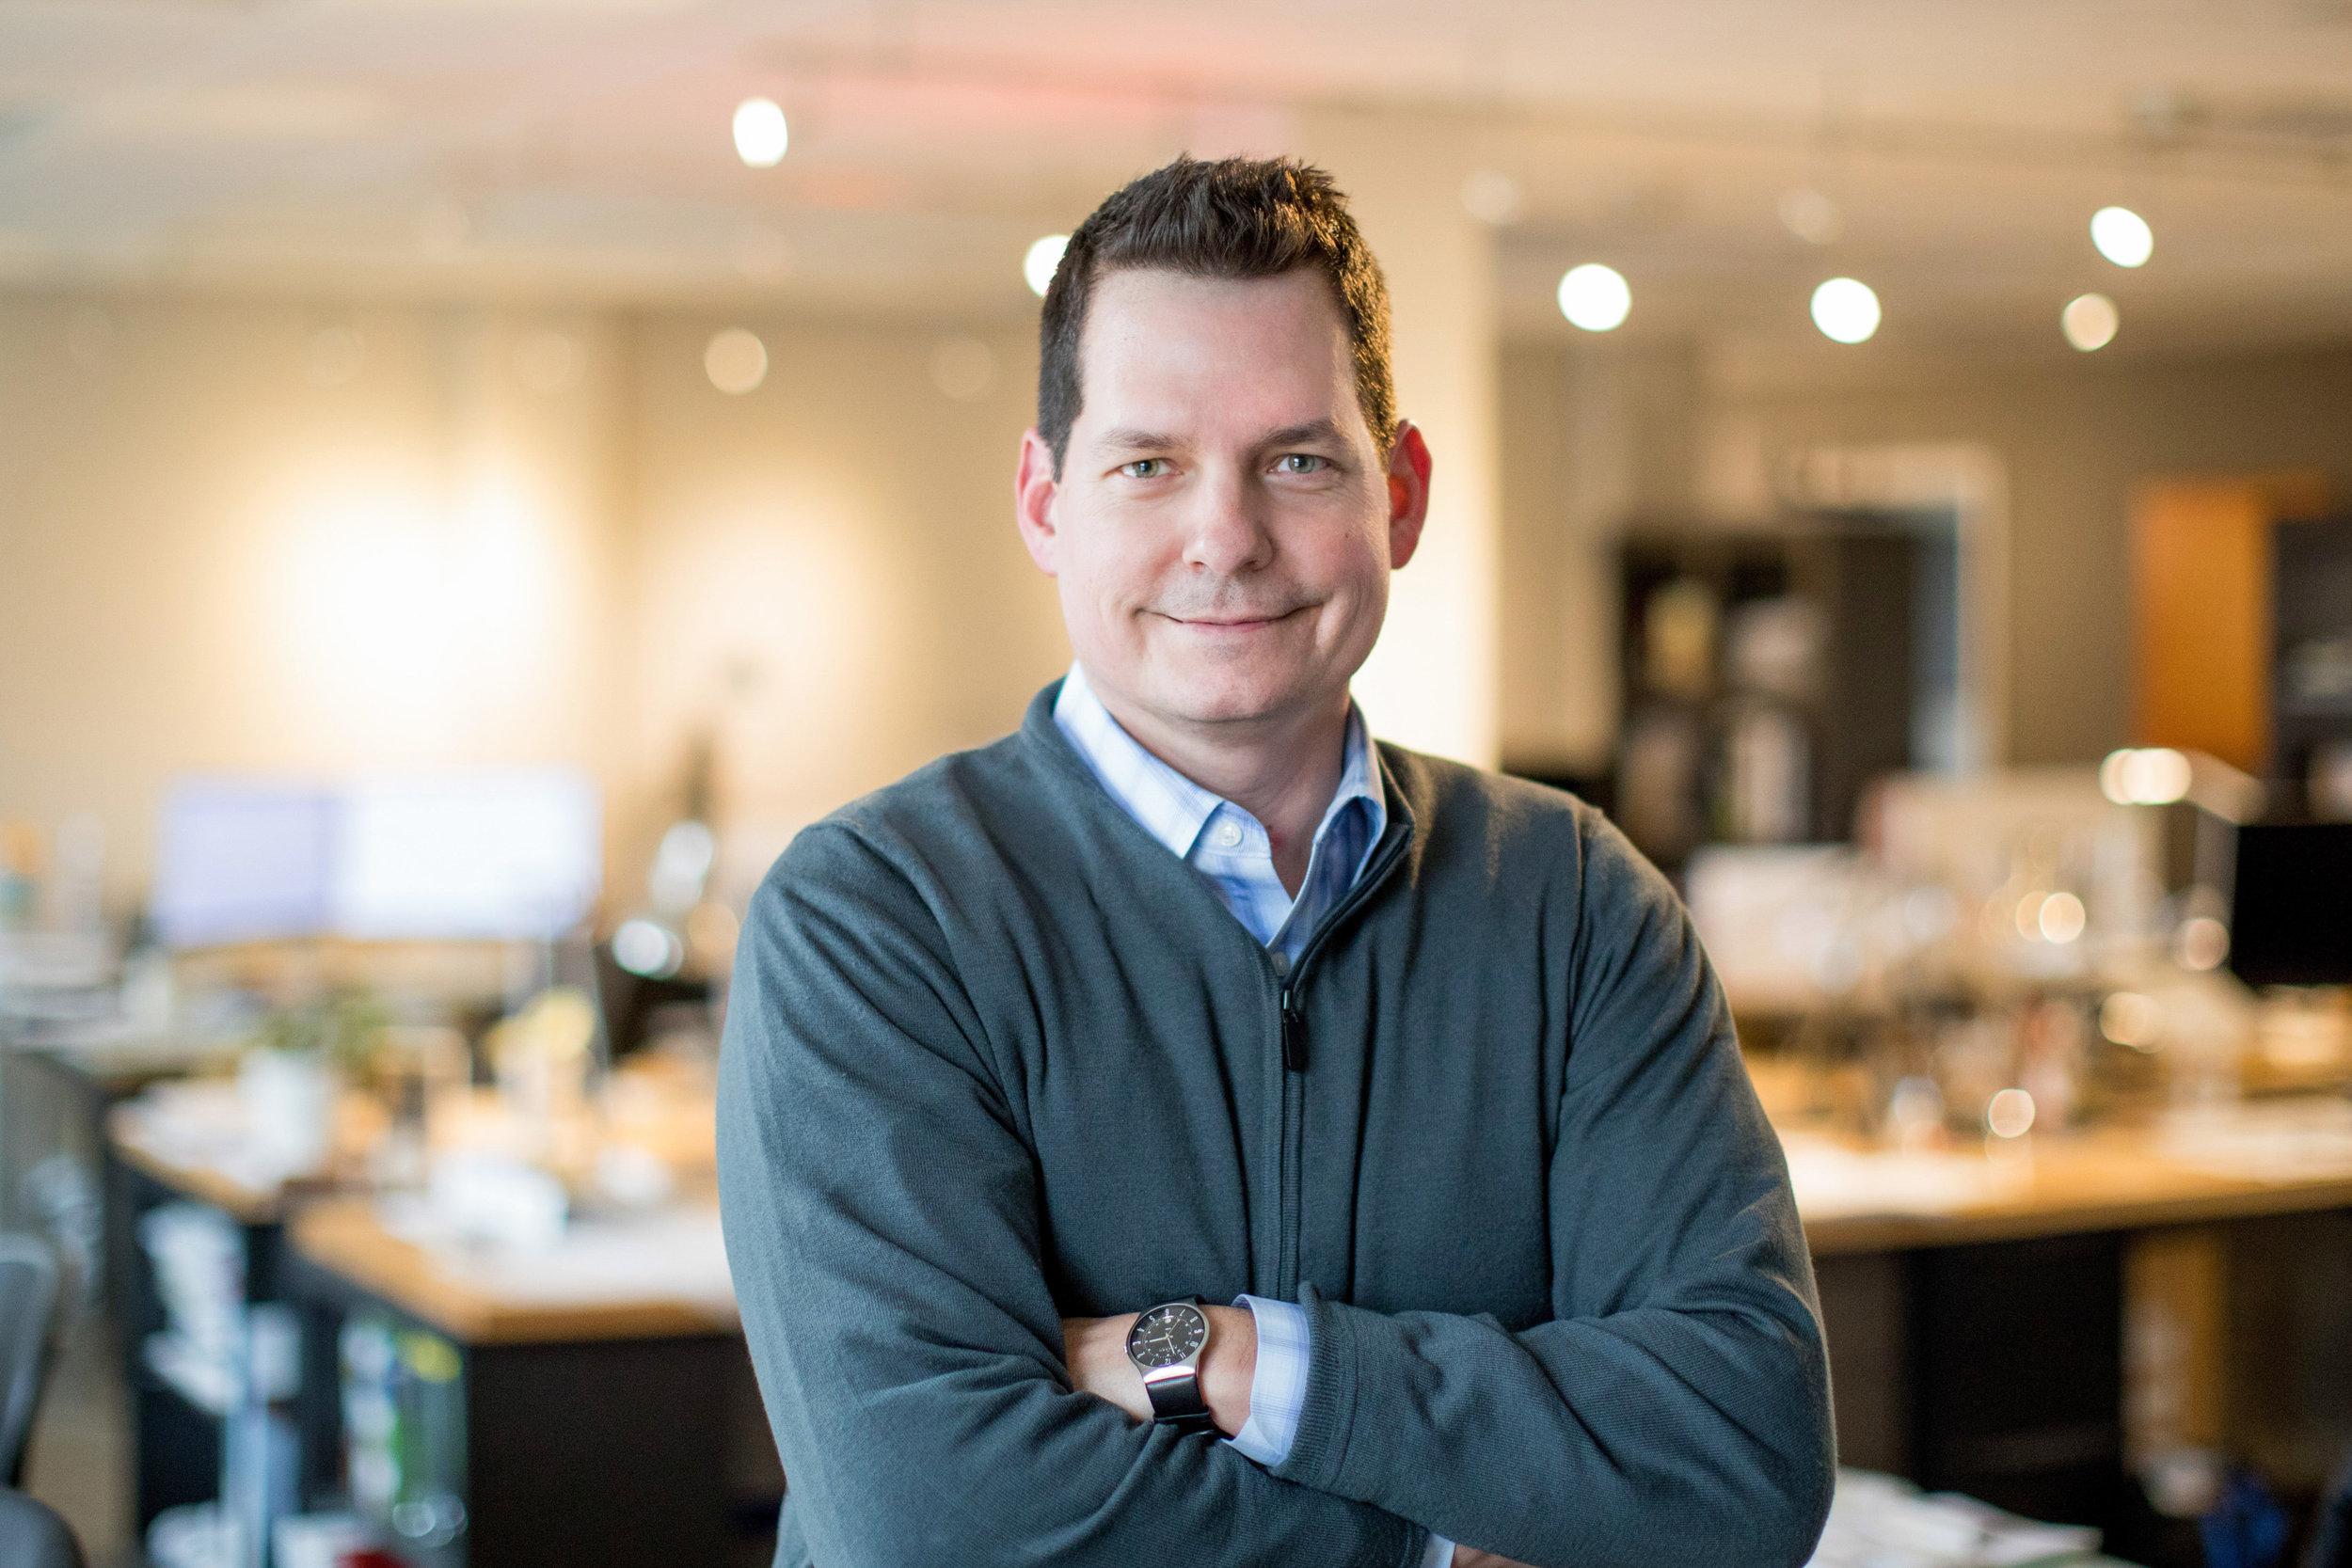 STEVE BURNS / PROJECT MANAGER - Bachelor of Architecture, Kansas State University